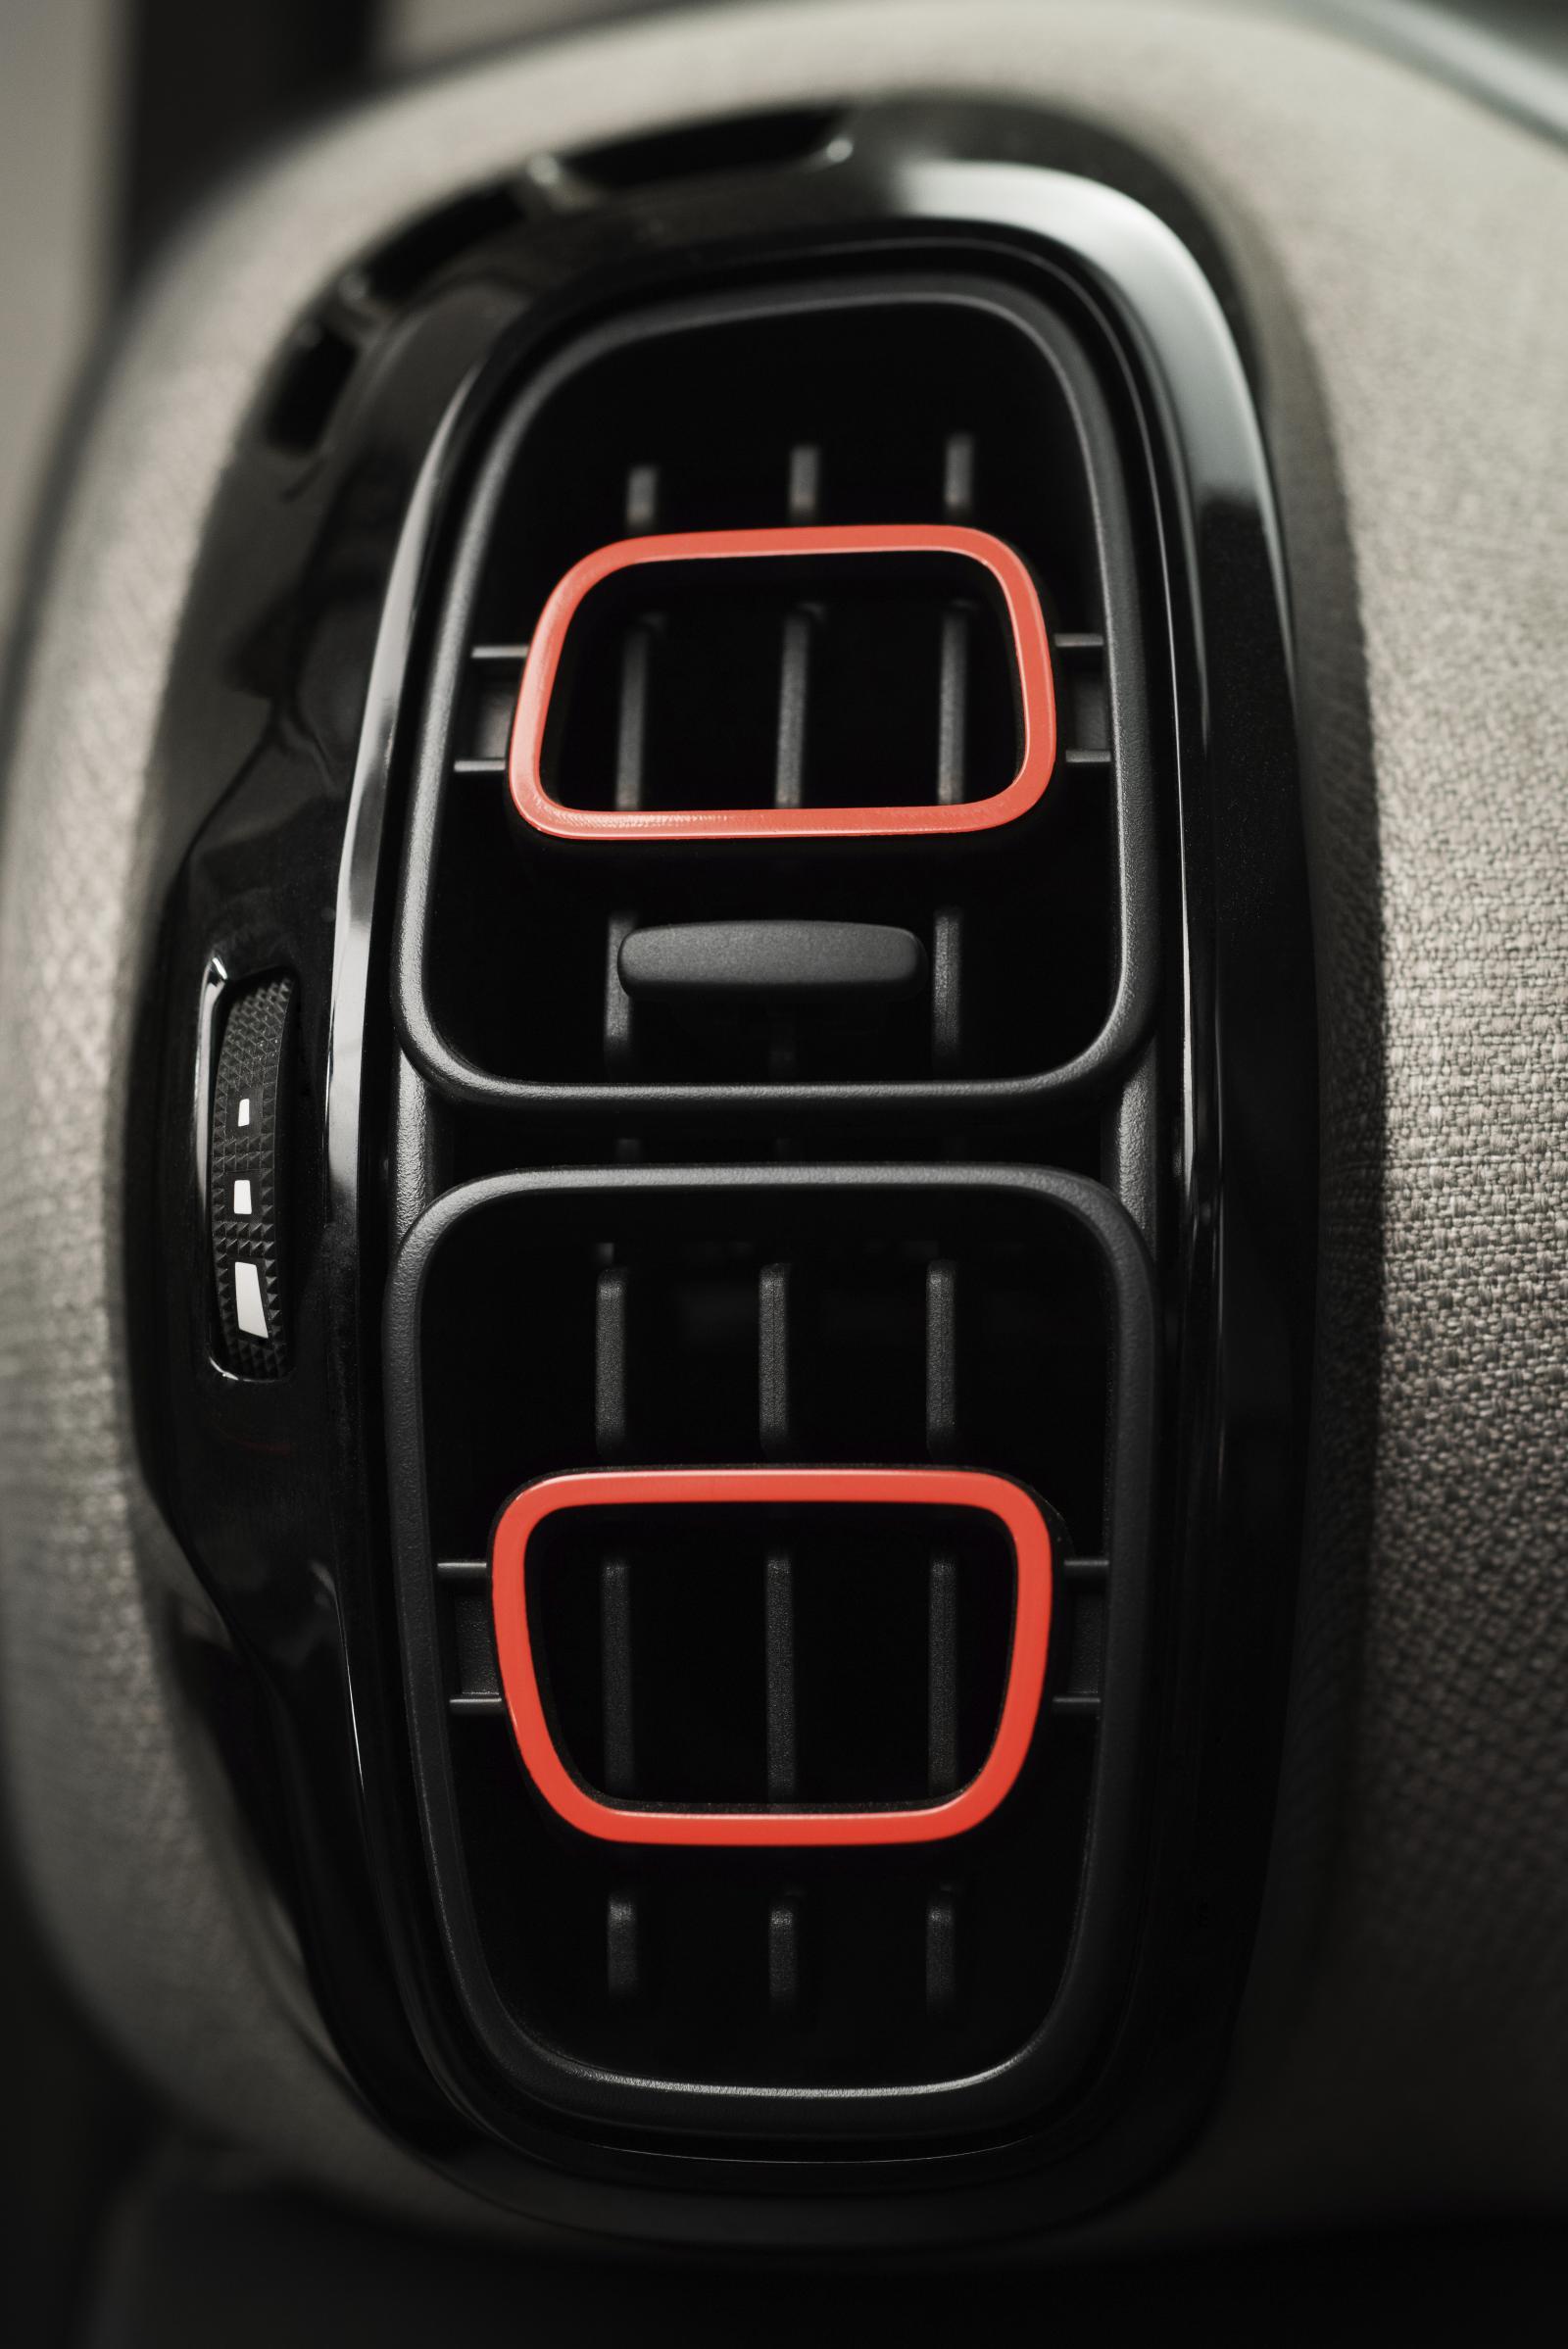 SUV Compact C3 Aircross - Ventiladores